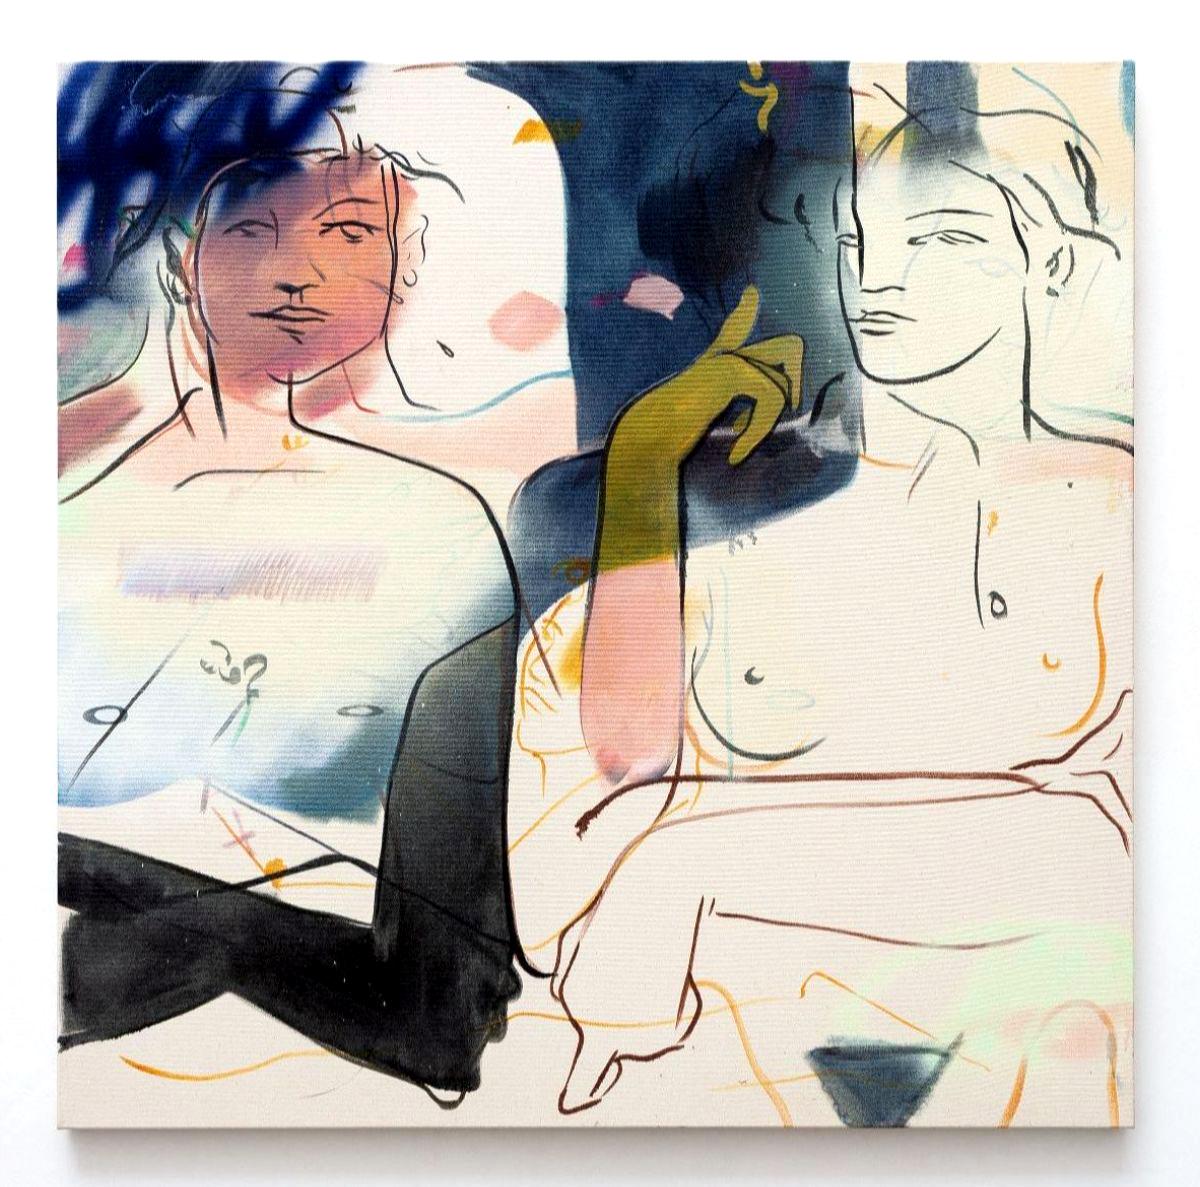 France-Lise McGurn, Lead Bellies, 2018